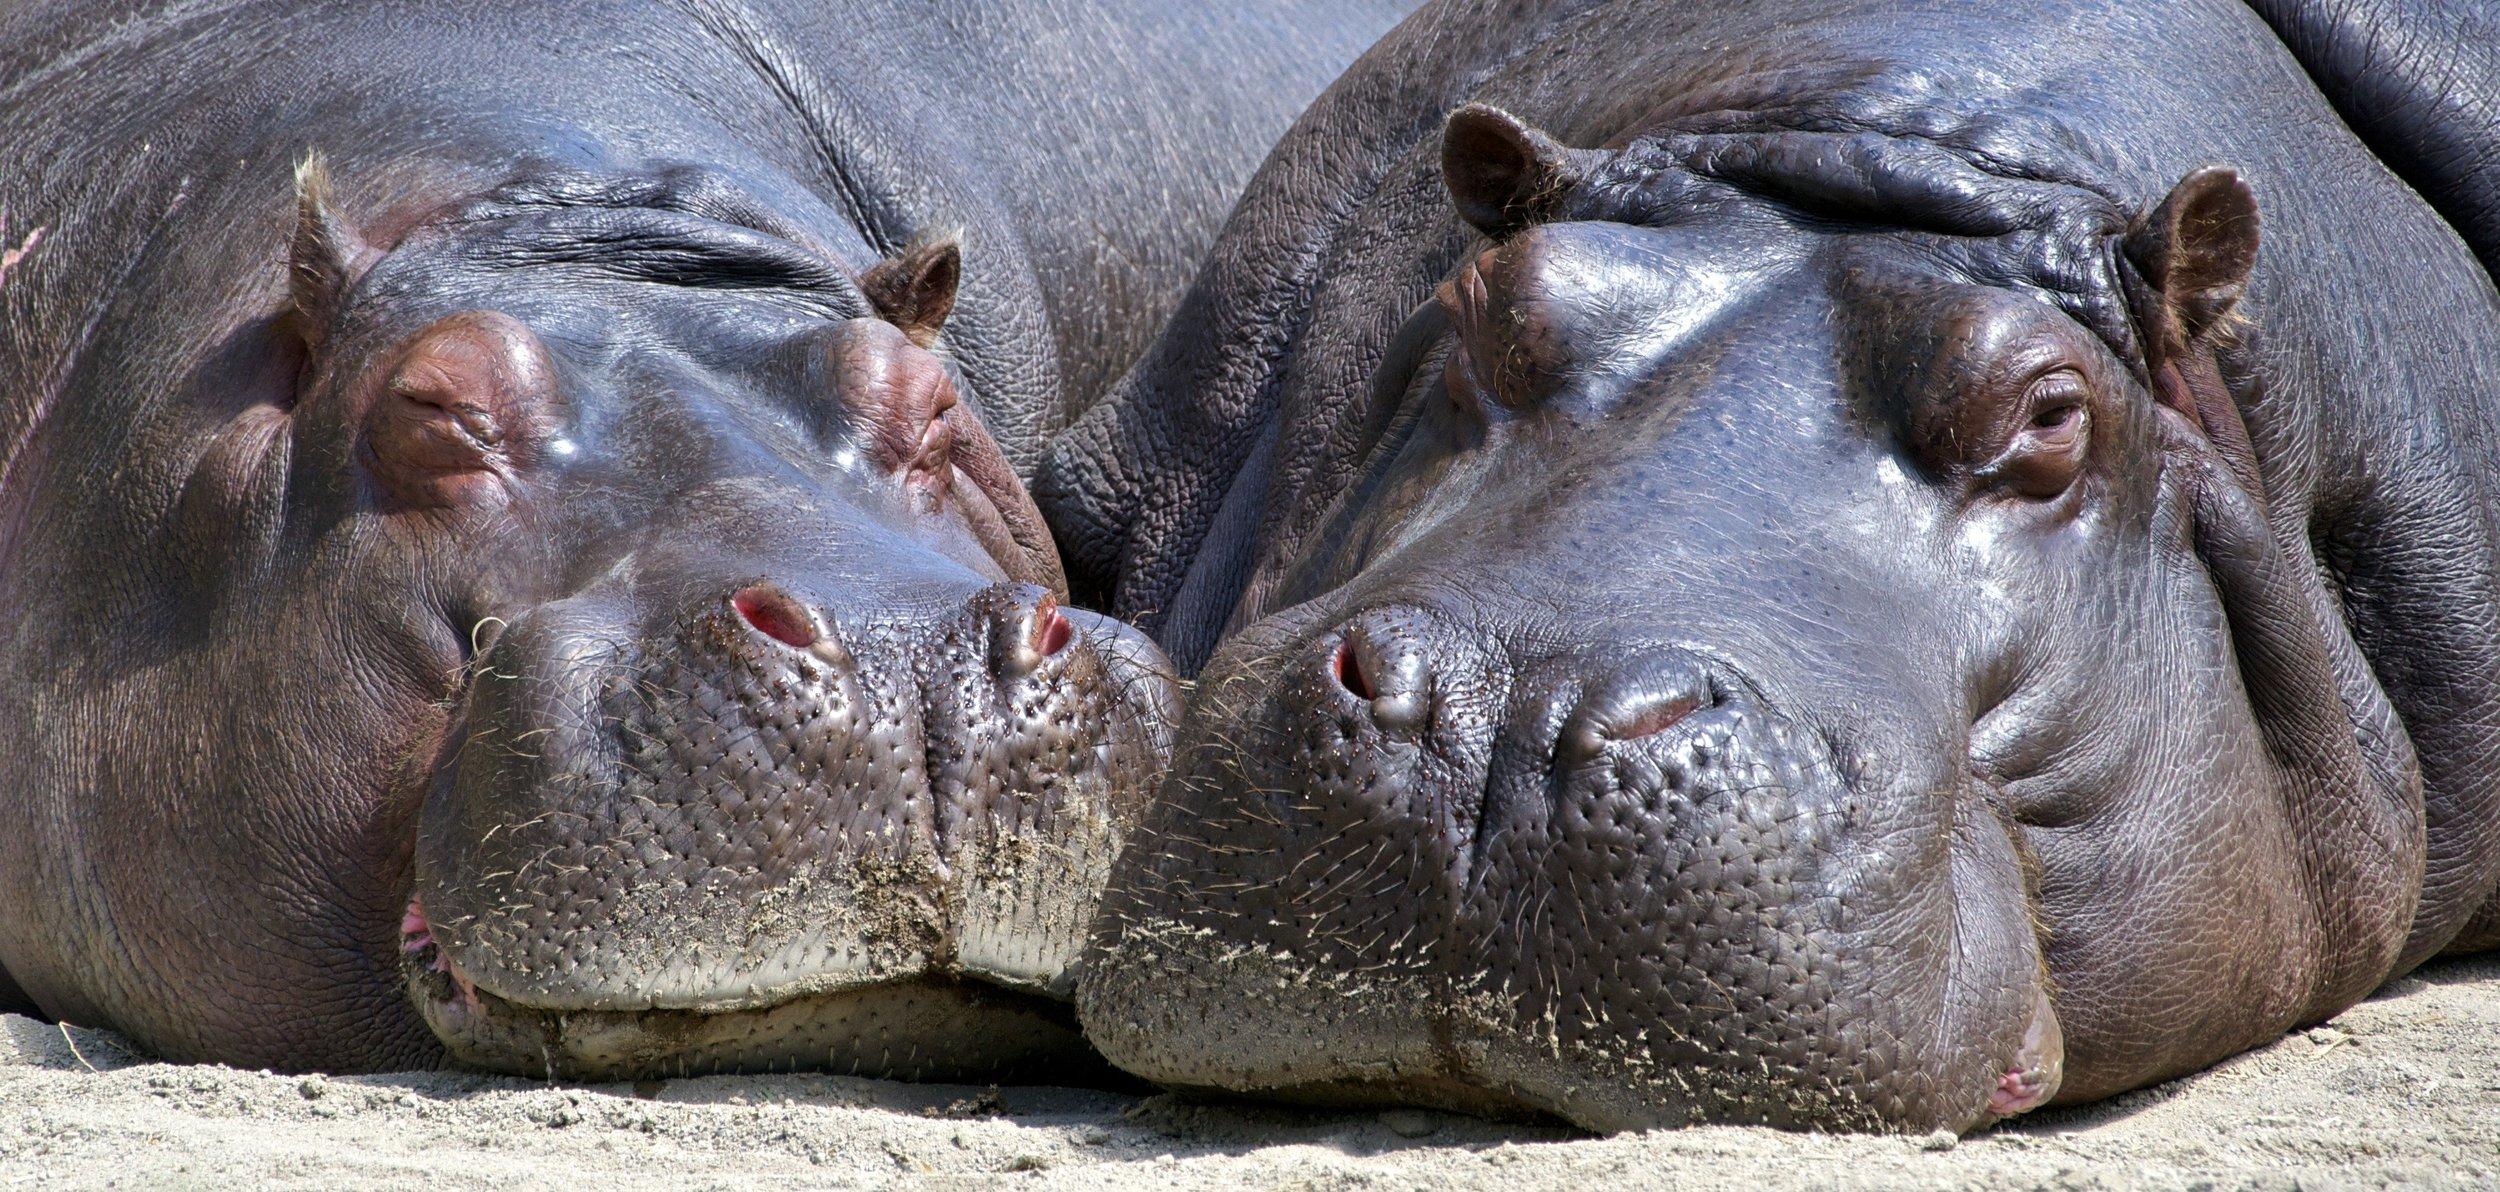 animals-close-up-hippopotamuses-35995.jpg